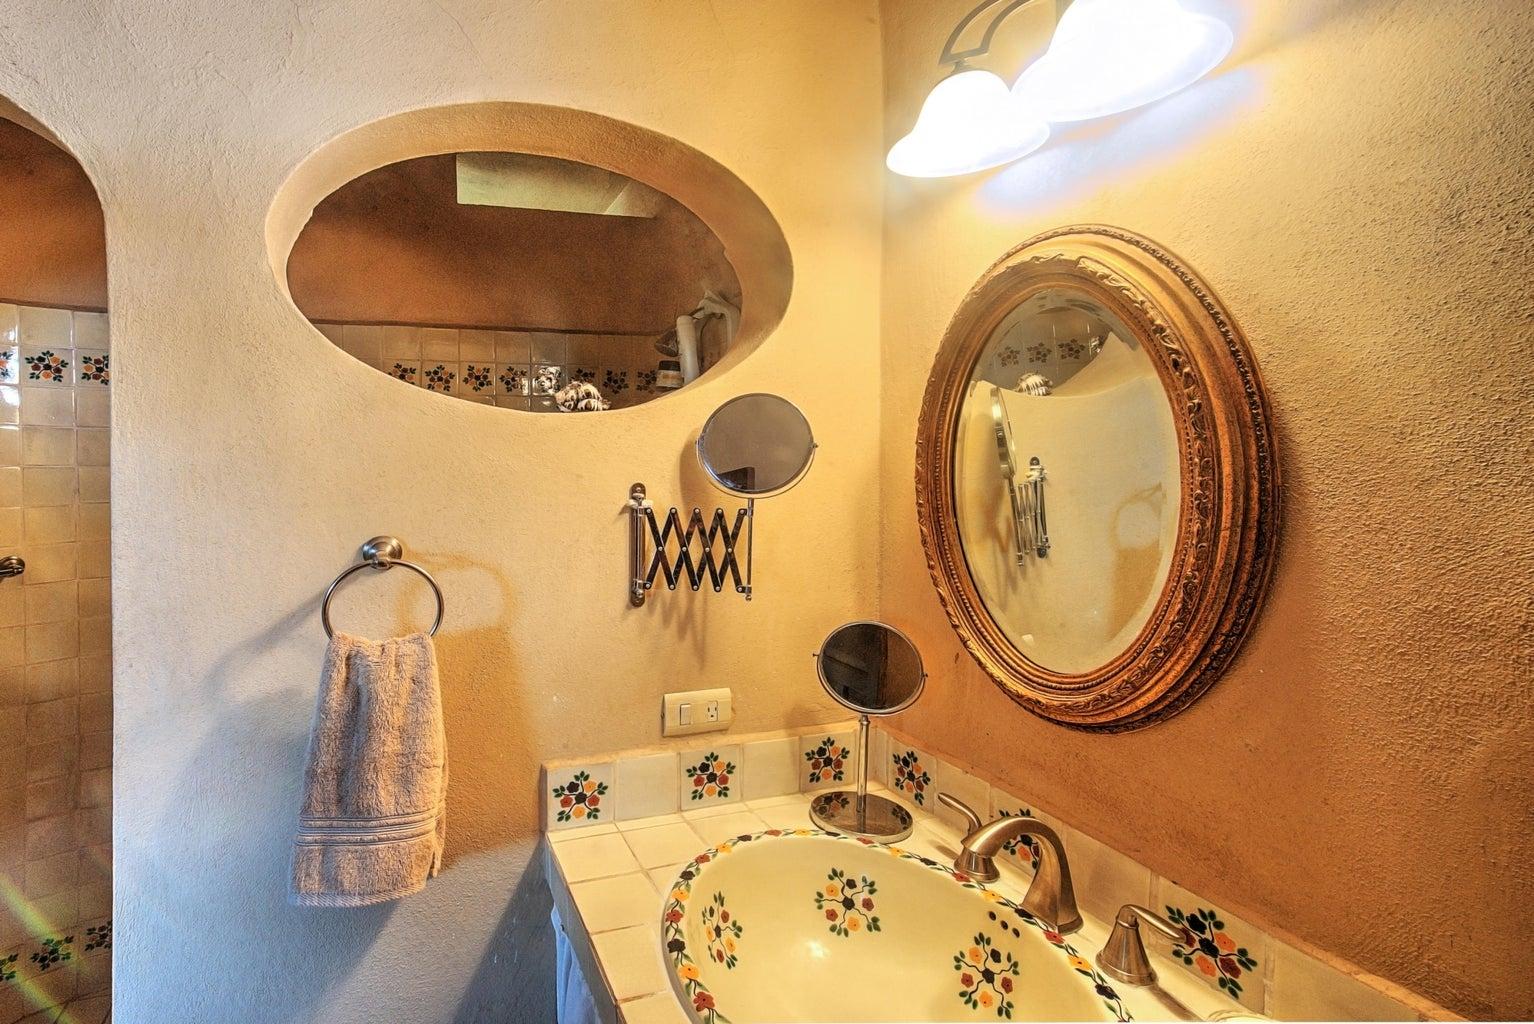 Shared bathroom in main home